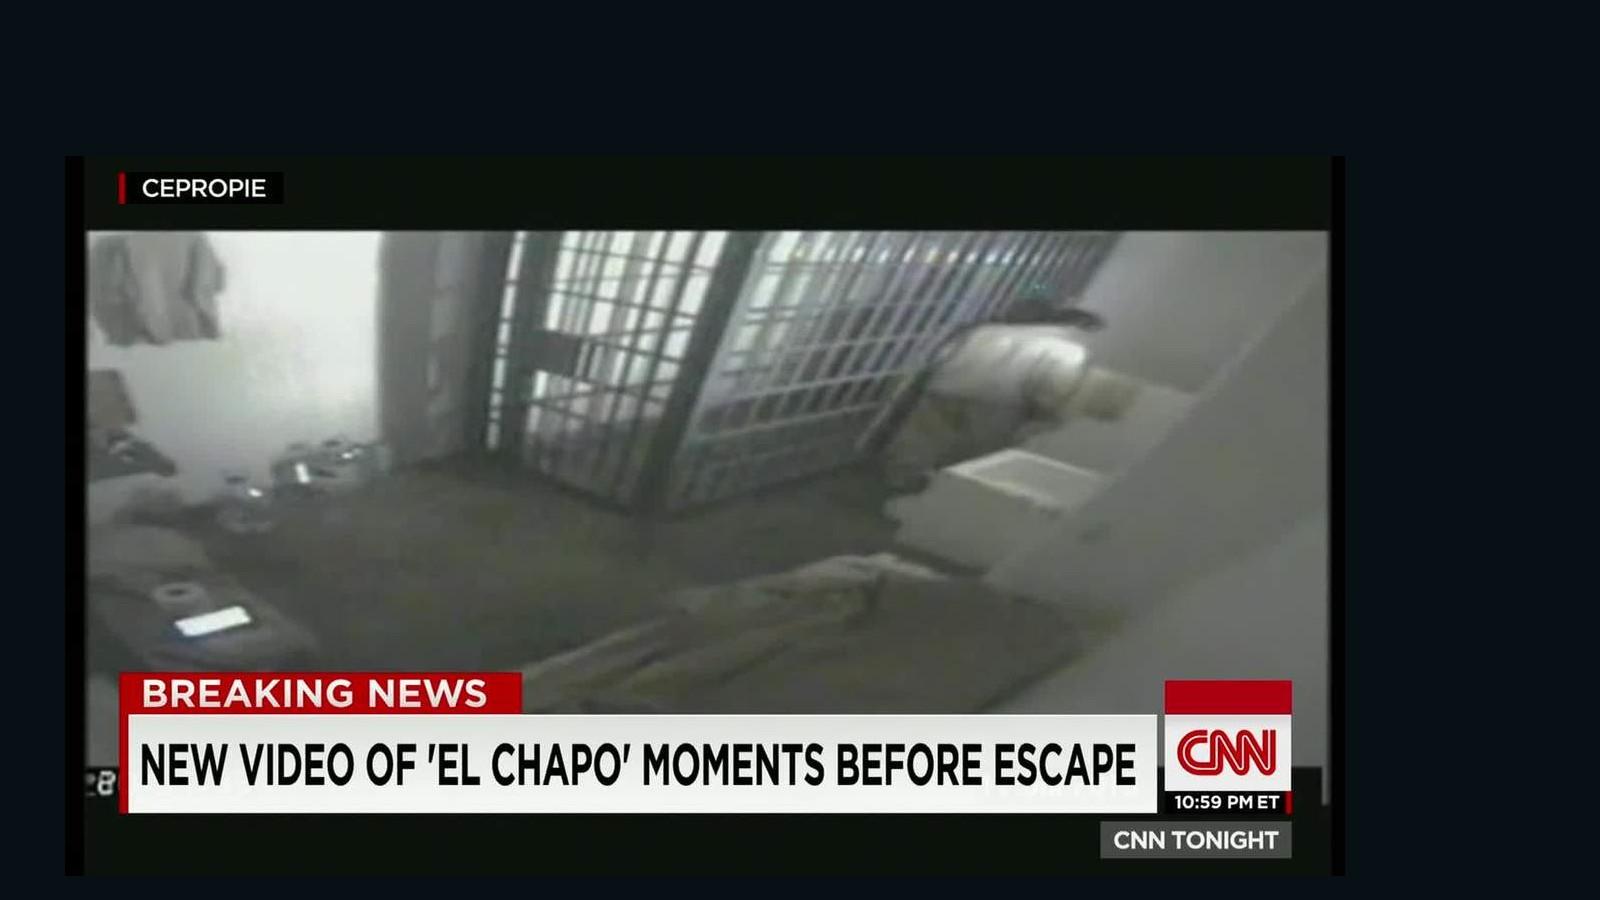 el chapo escape 2015 video